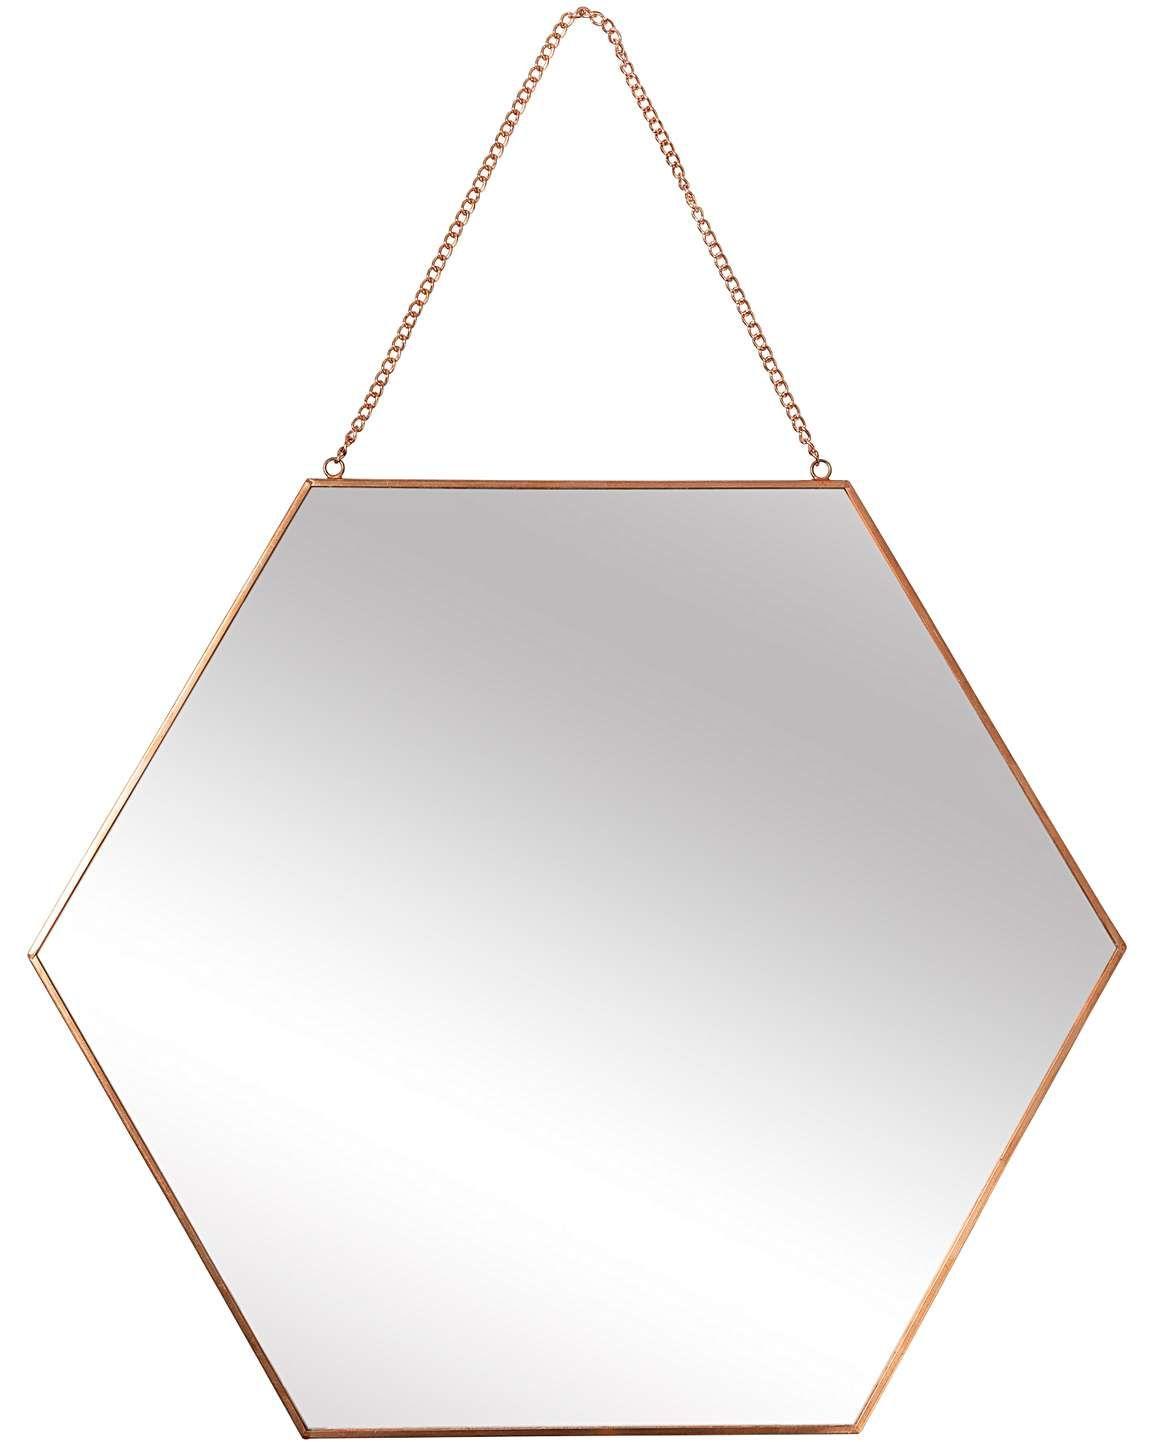 Rose Gold Hexagon Hanging Wall Mirror Large Mirror Rose Gold Gold